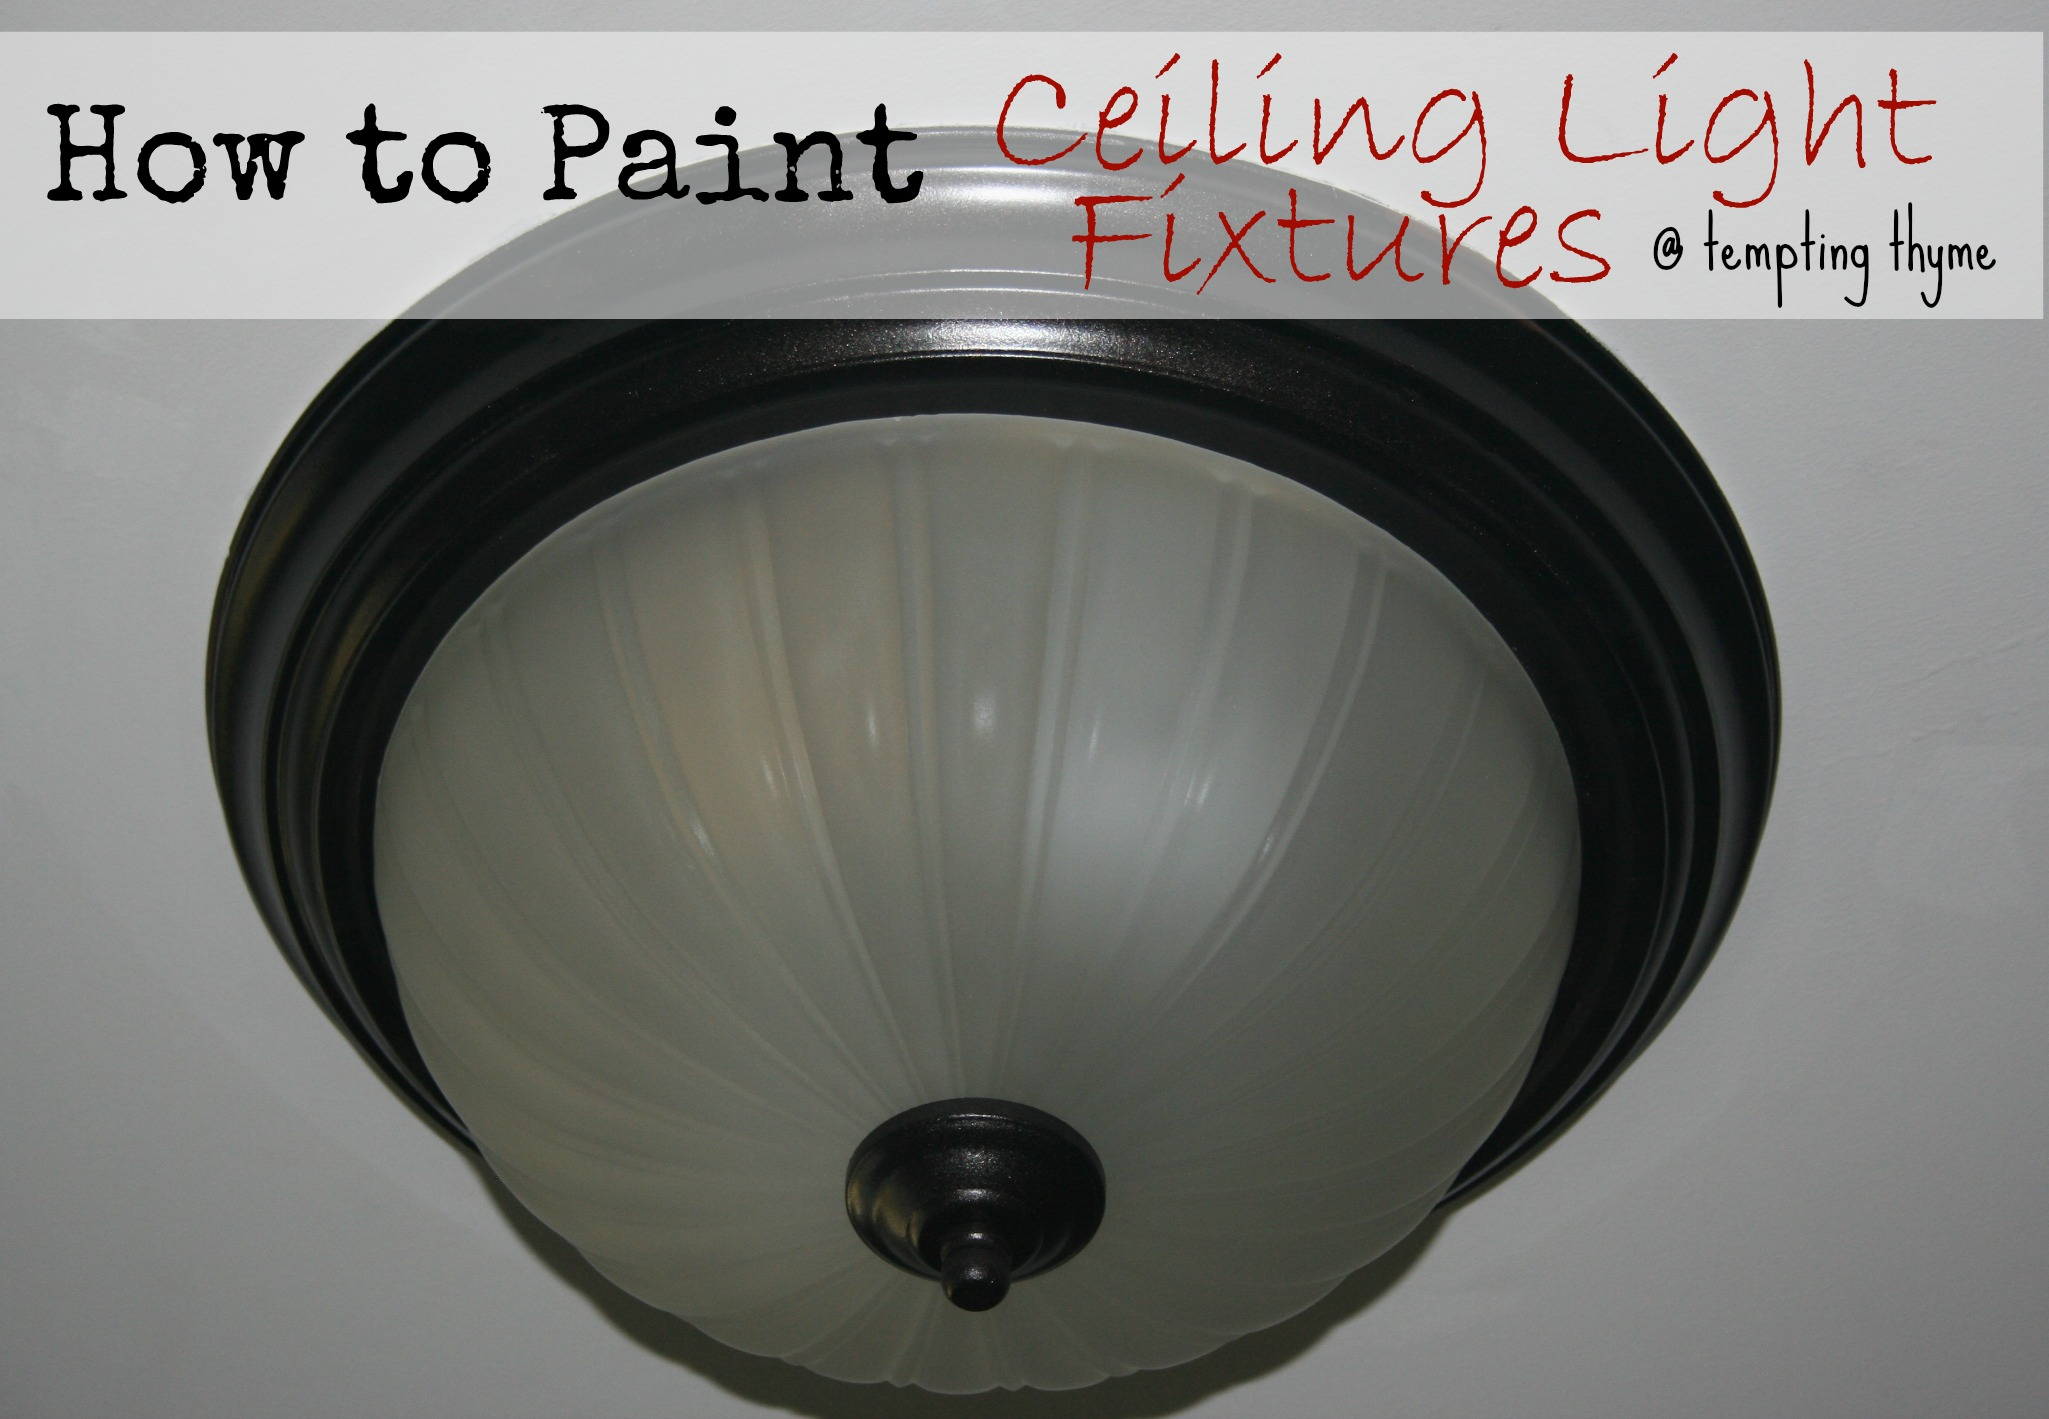 Taking Down Light Fixture